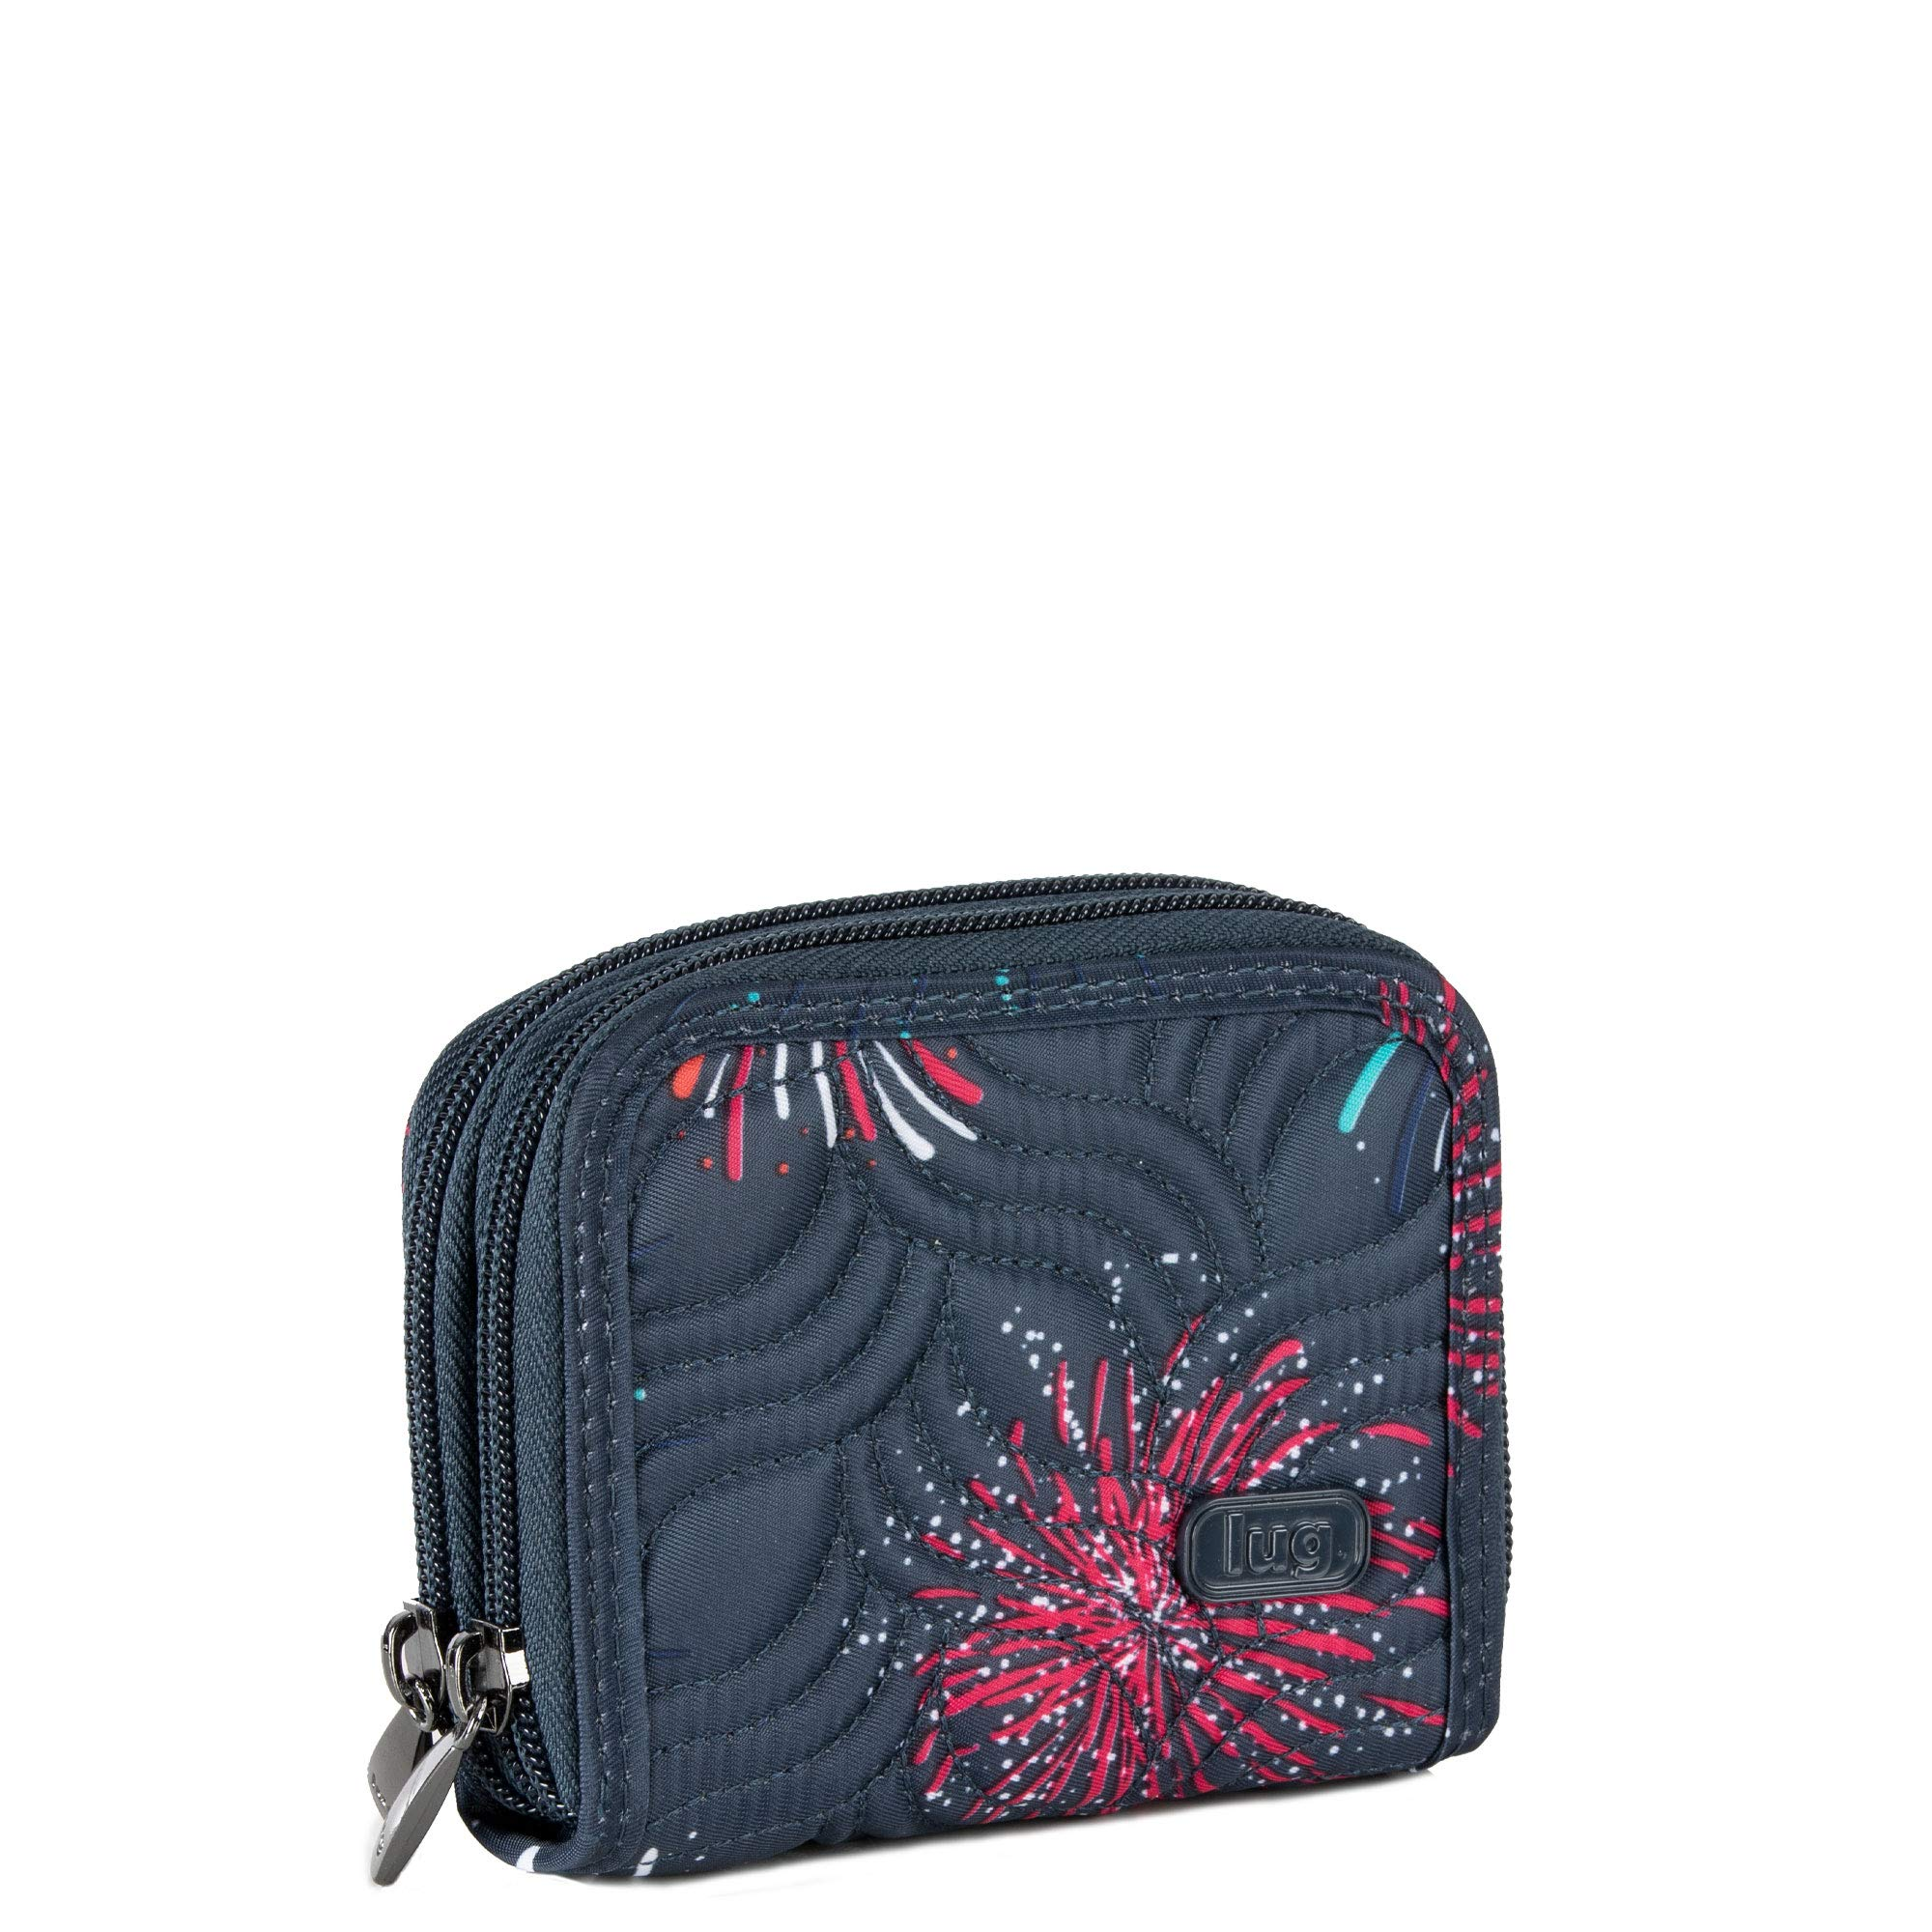 Lug Women's Splits Compact Wallet, Firework Blue